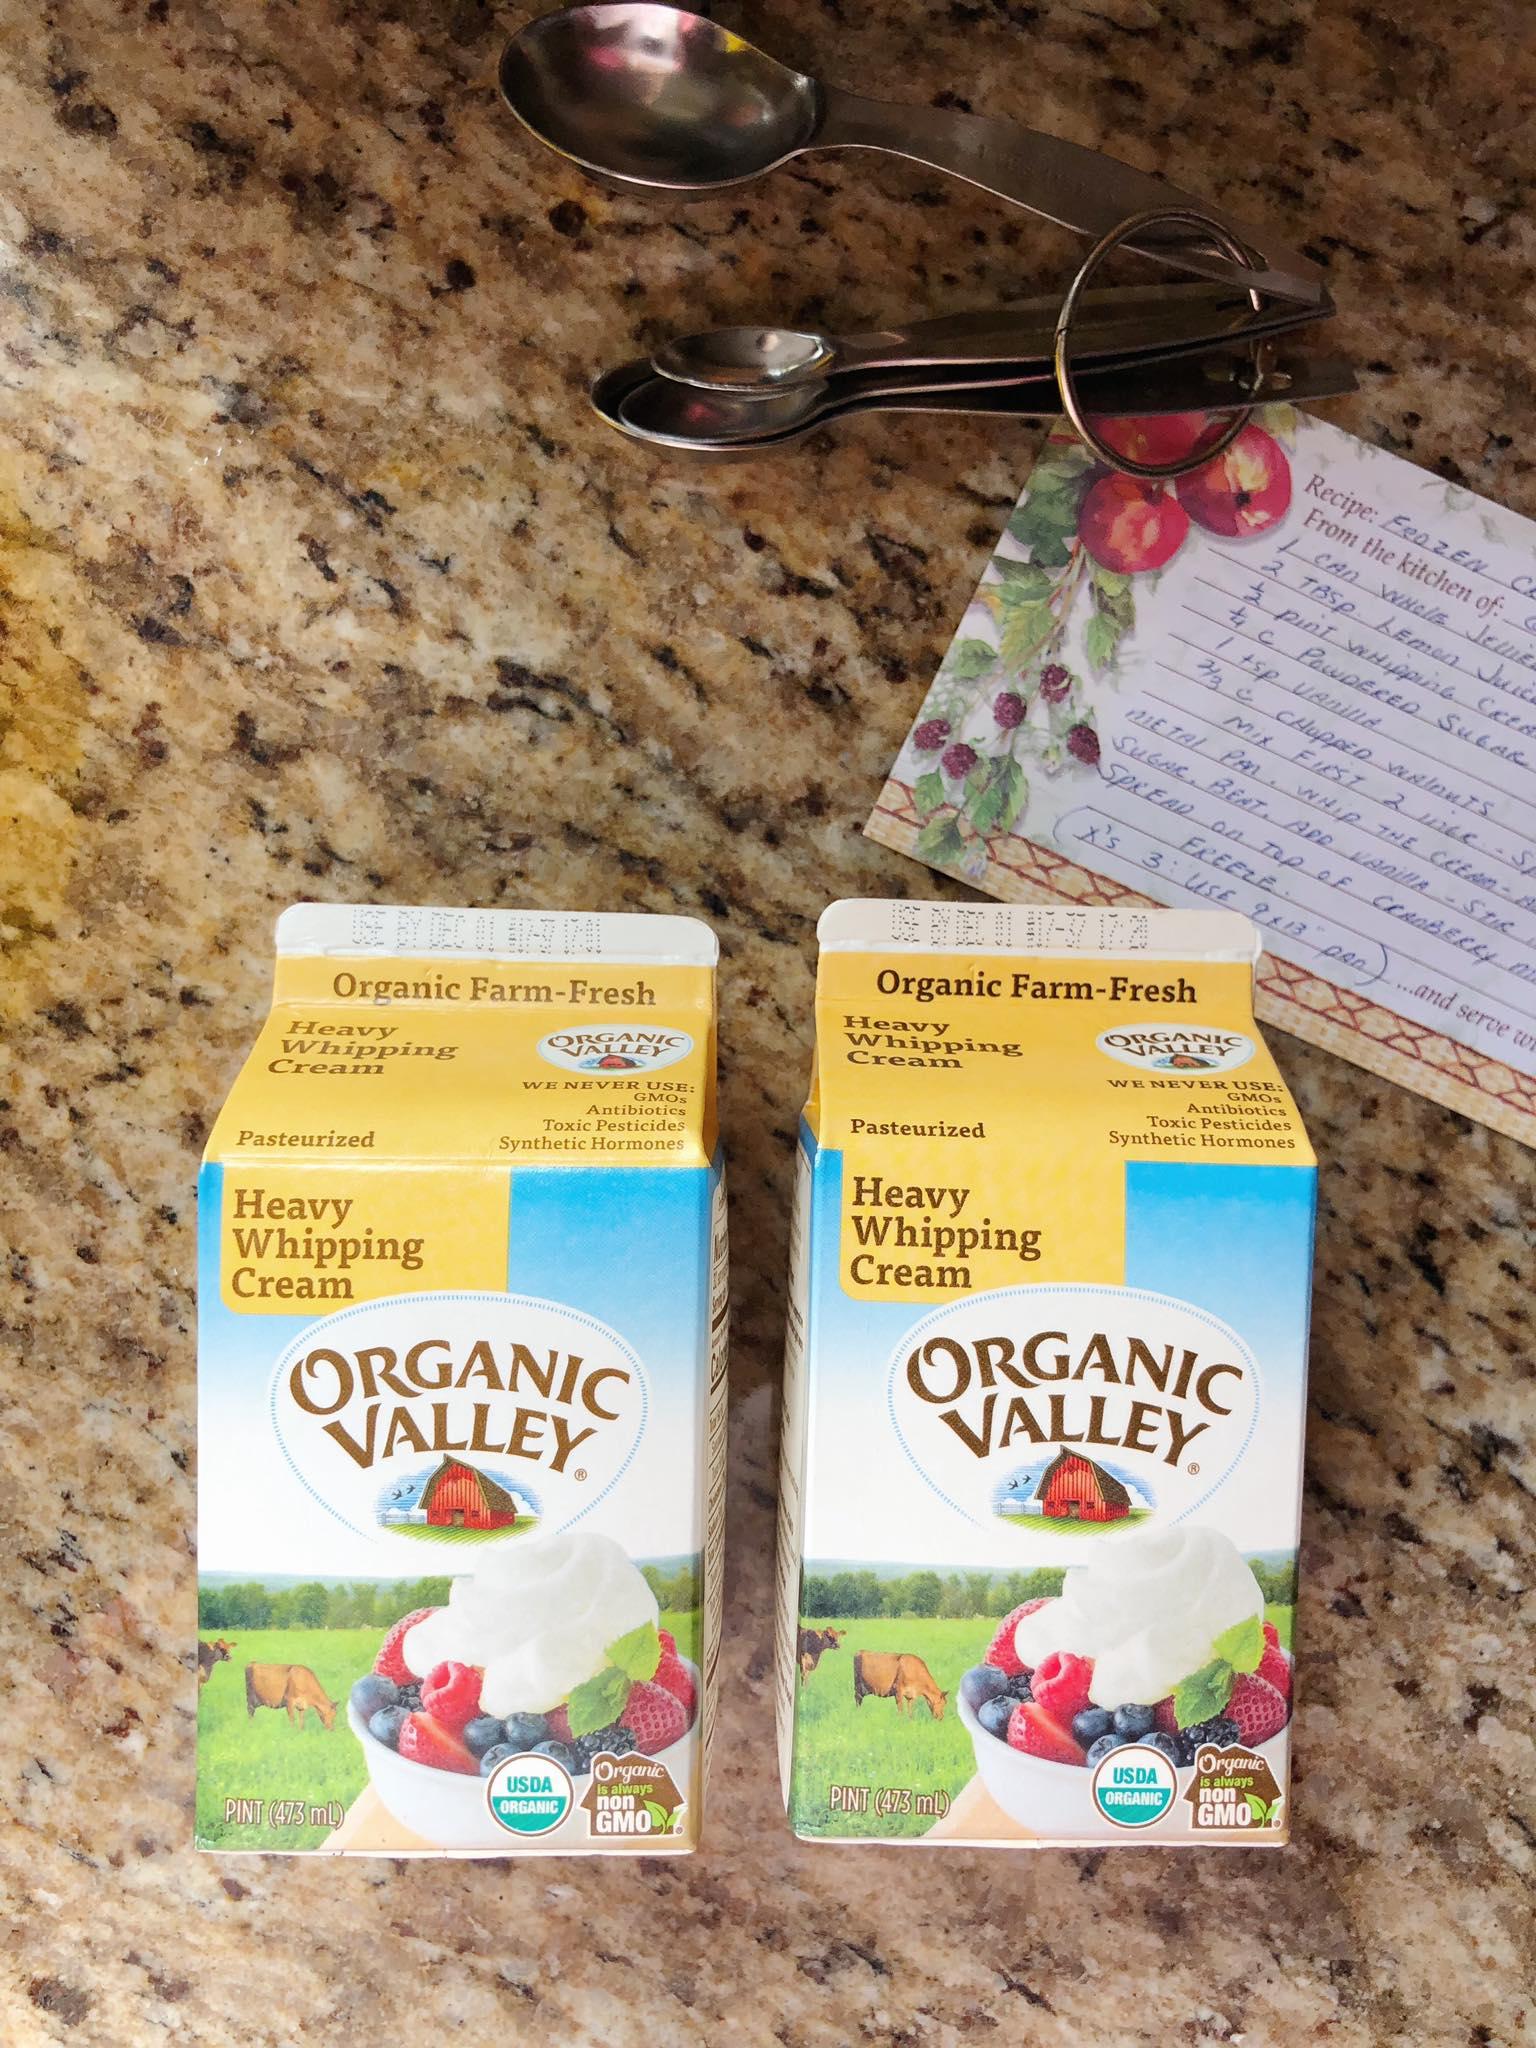 organic-valley-whipped-cream.jpg